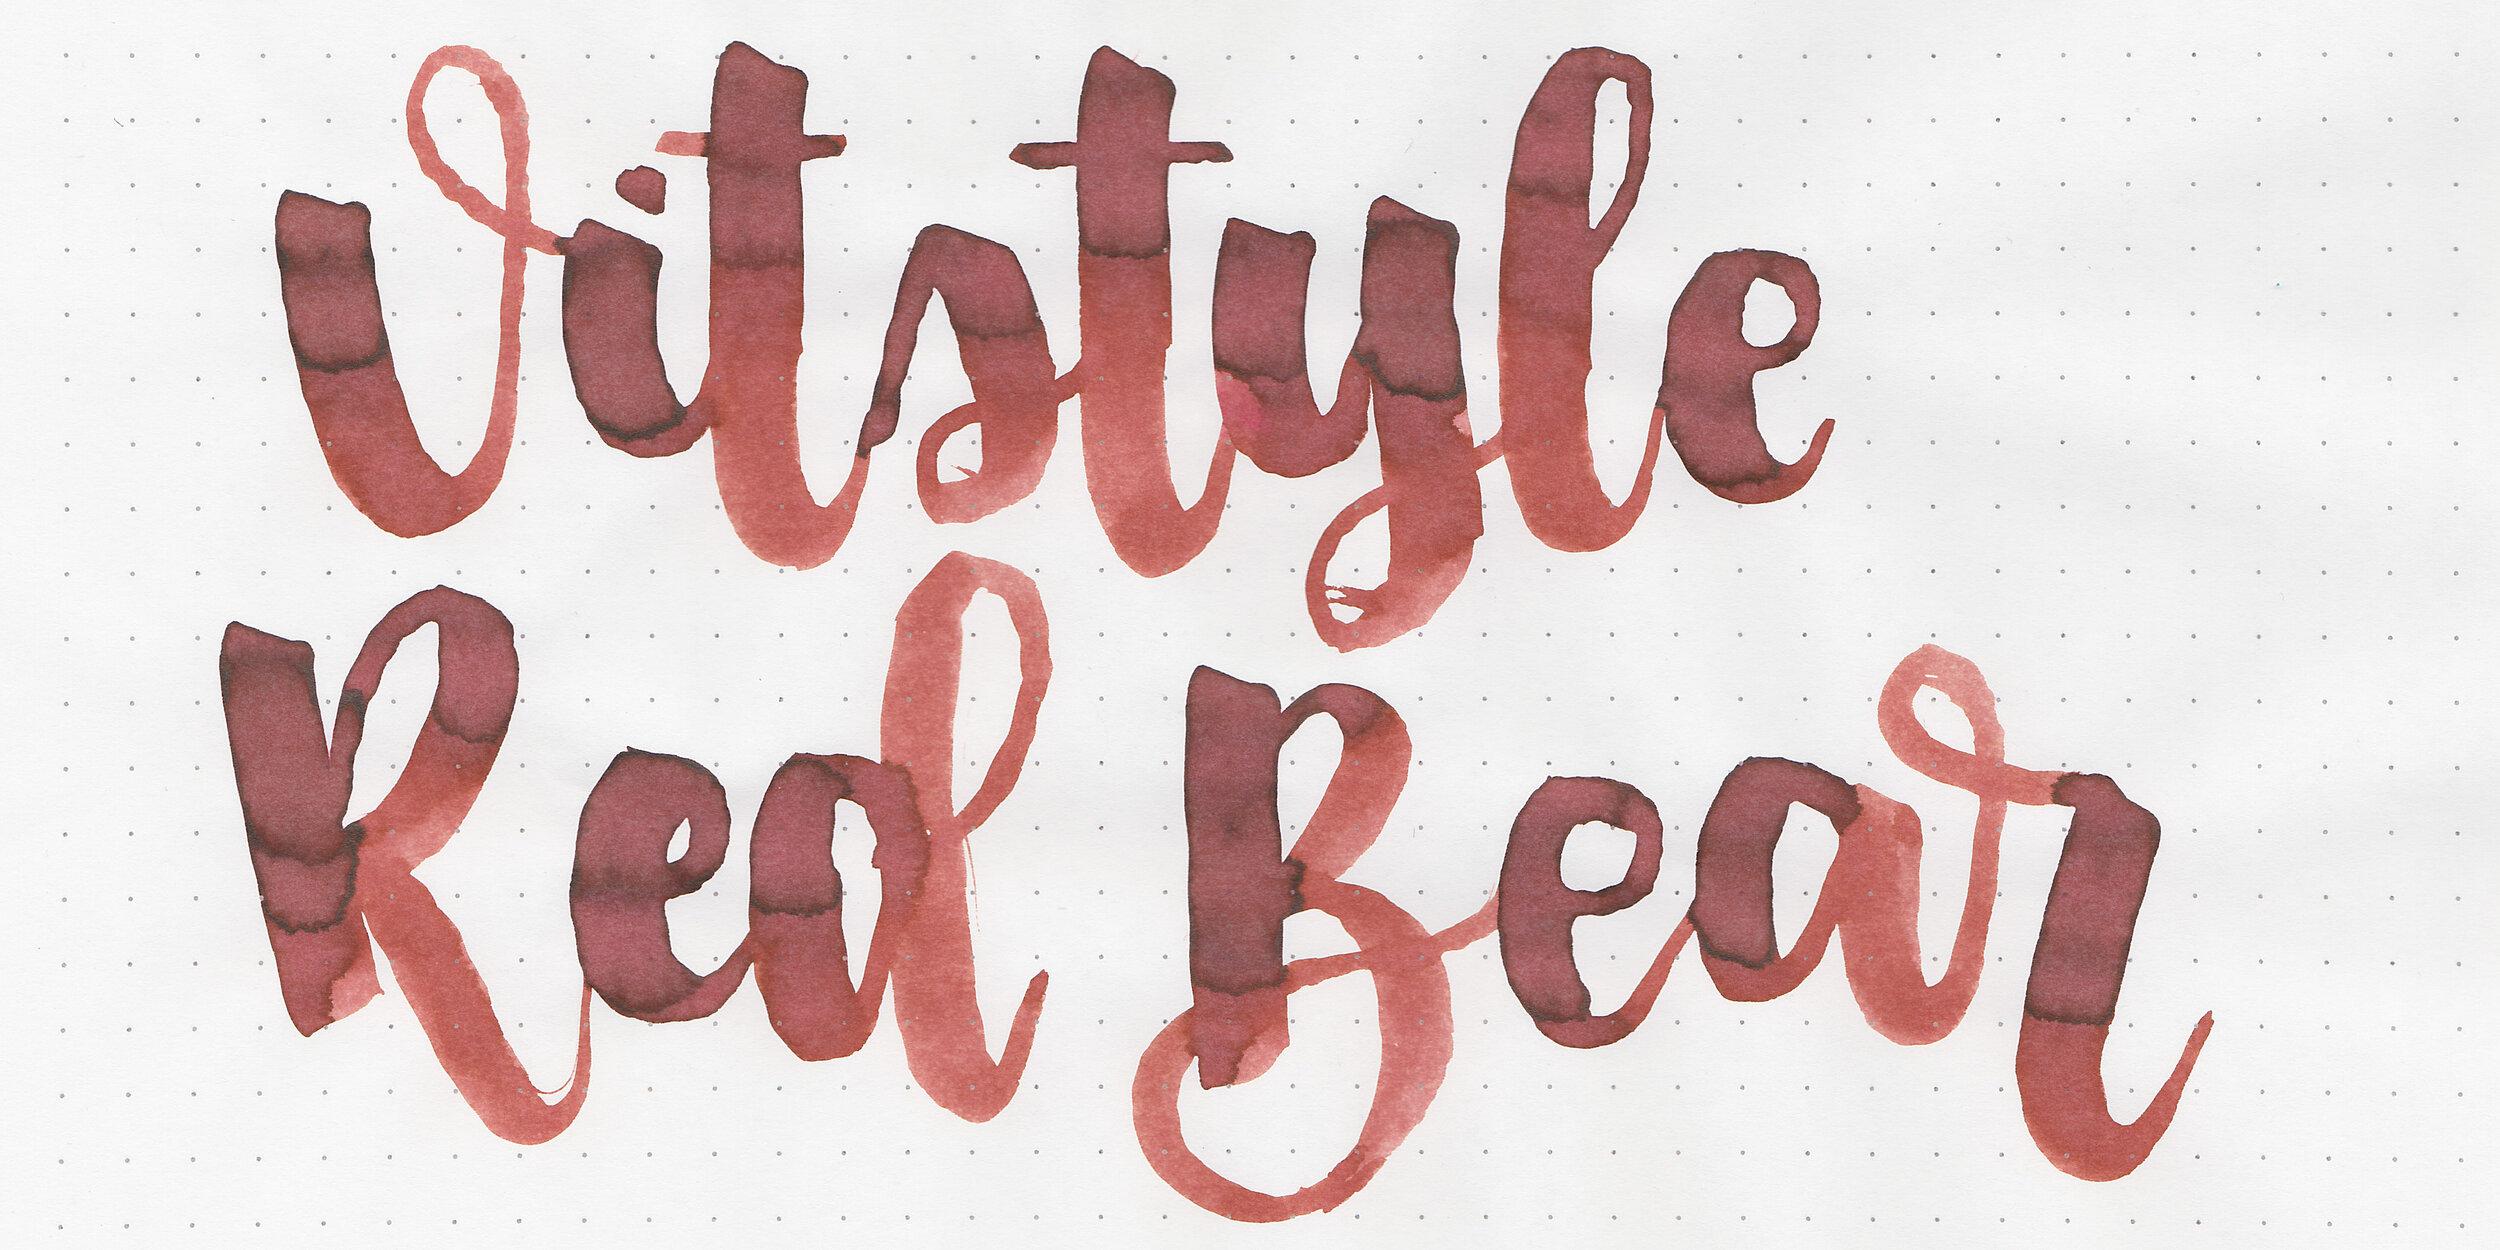 ro-vitsyle-red-bear-2.jpg